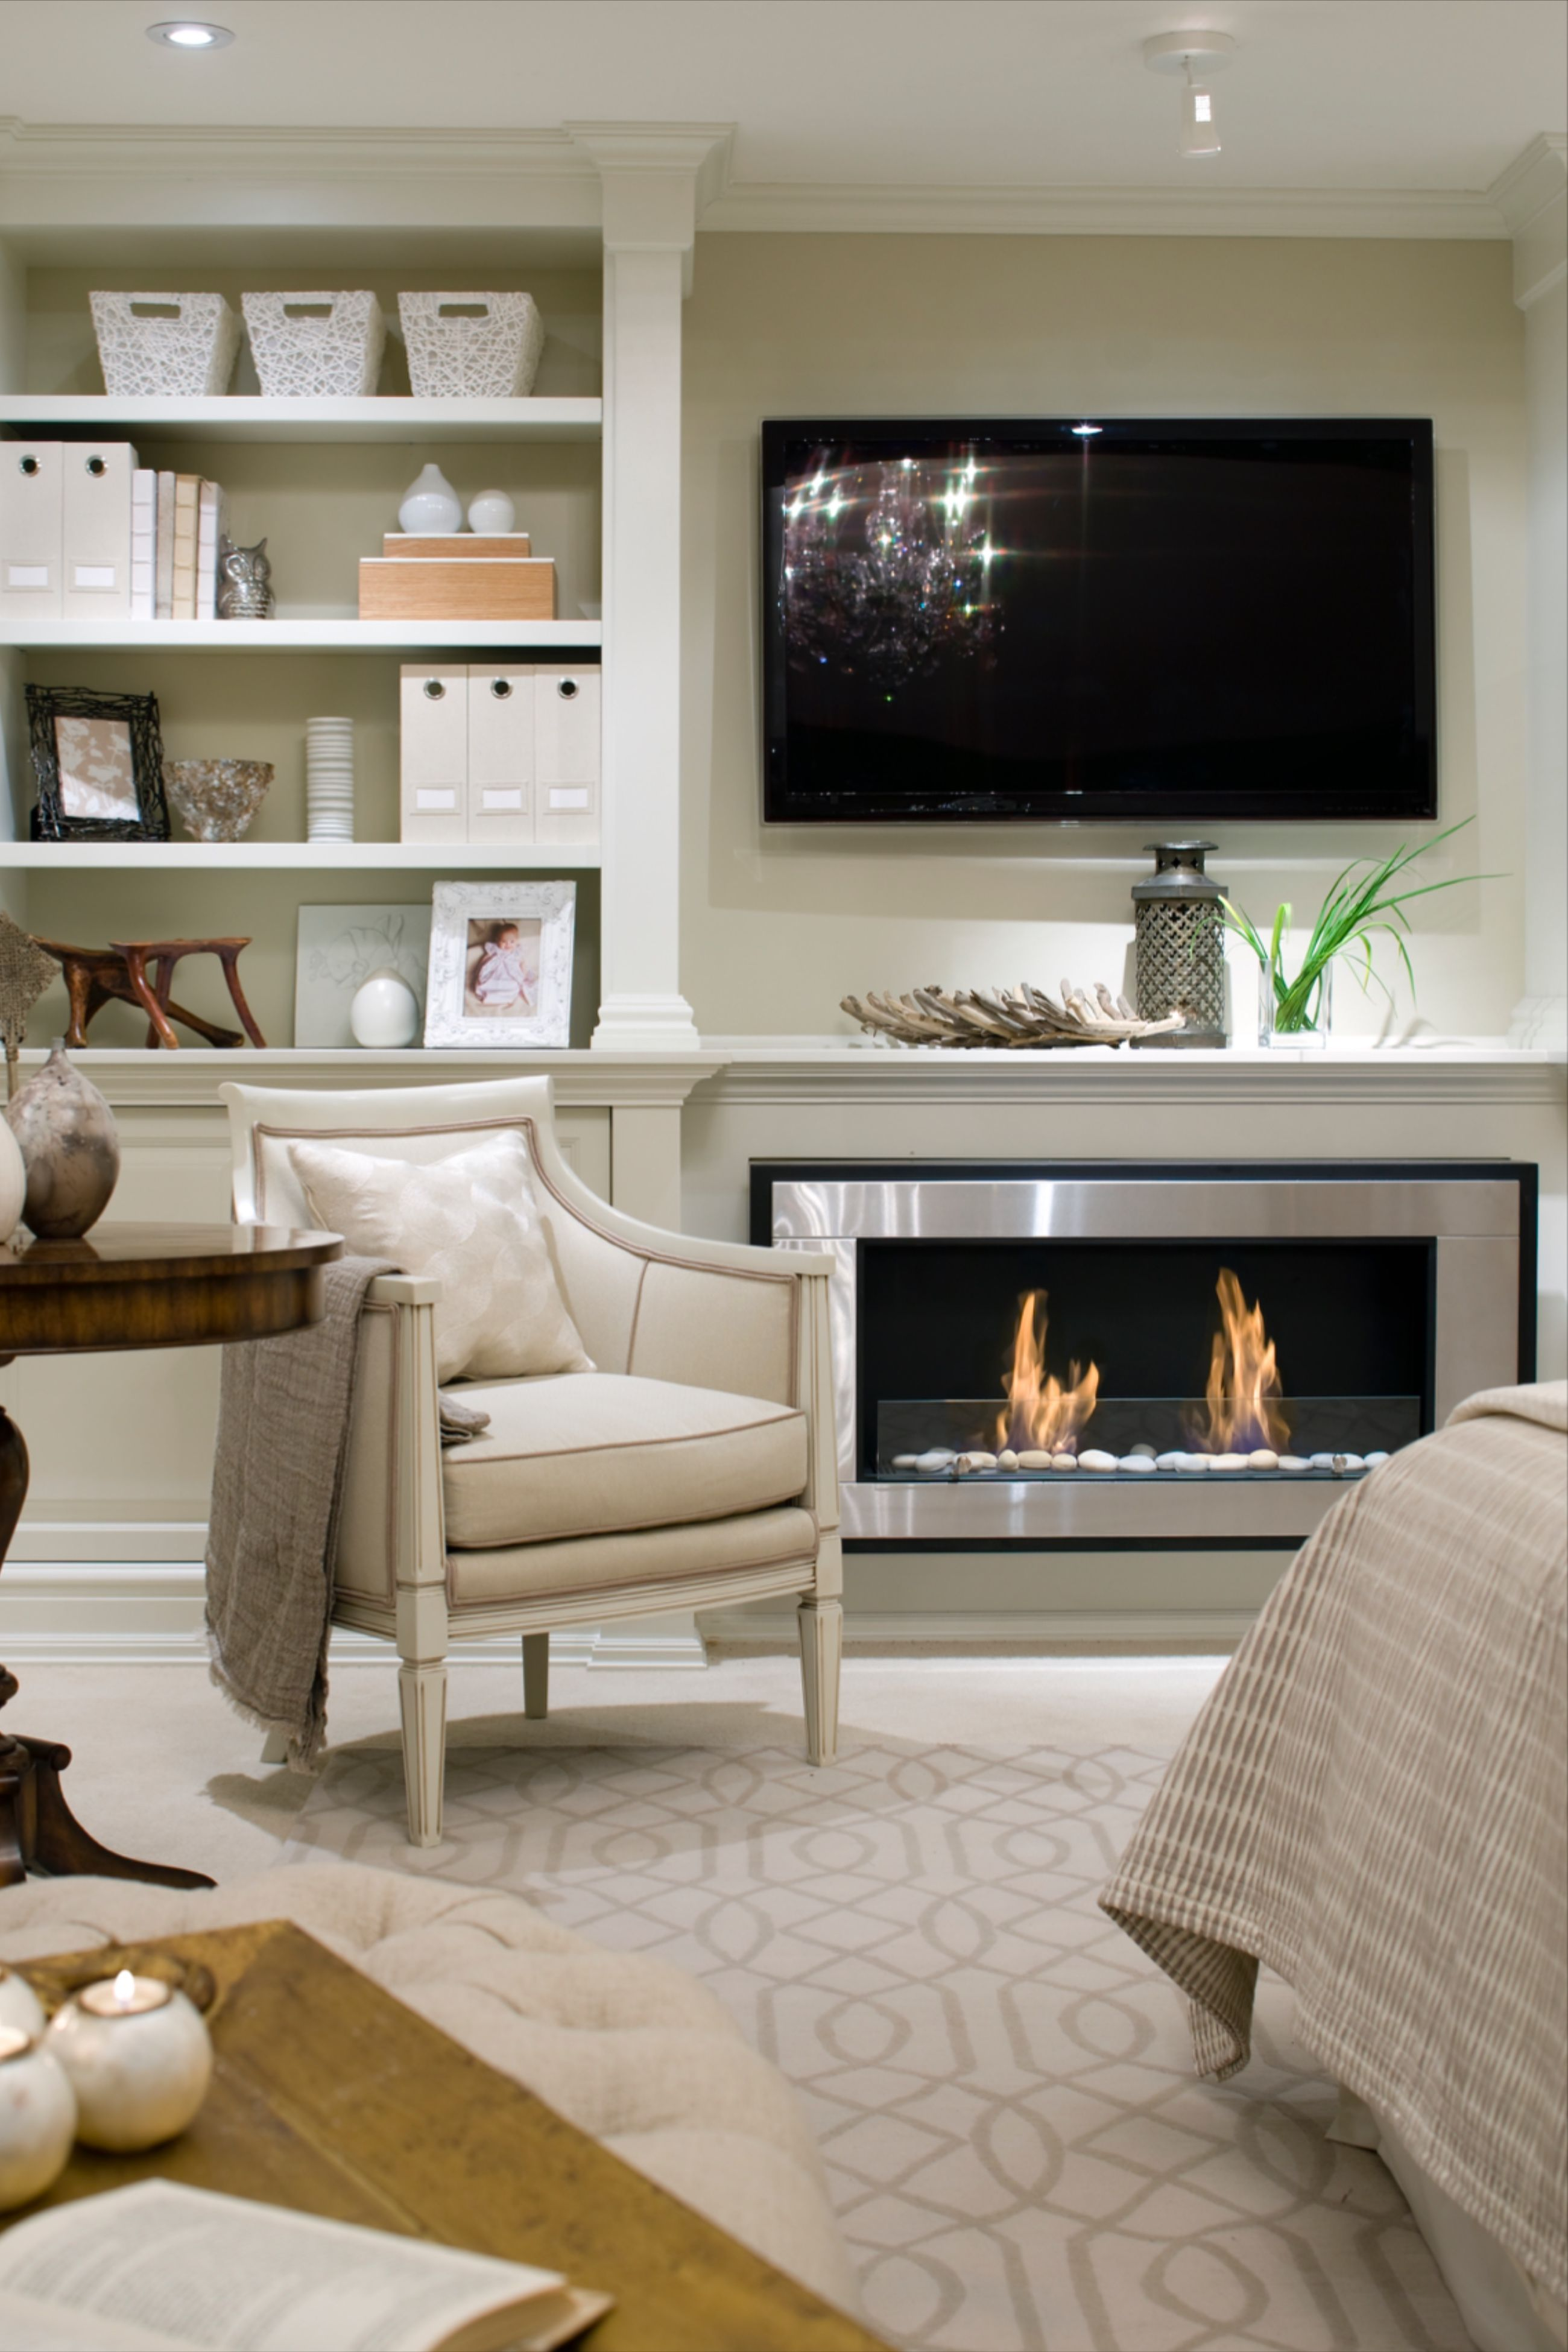 Candice Olson On Bedroom Design In 2020 Fireplace Design Family Room Design Livingroom Layout